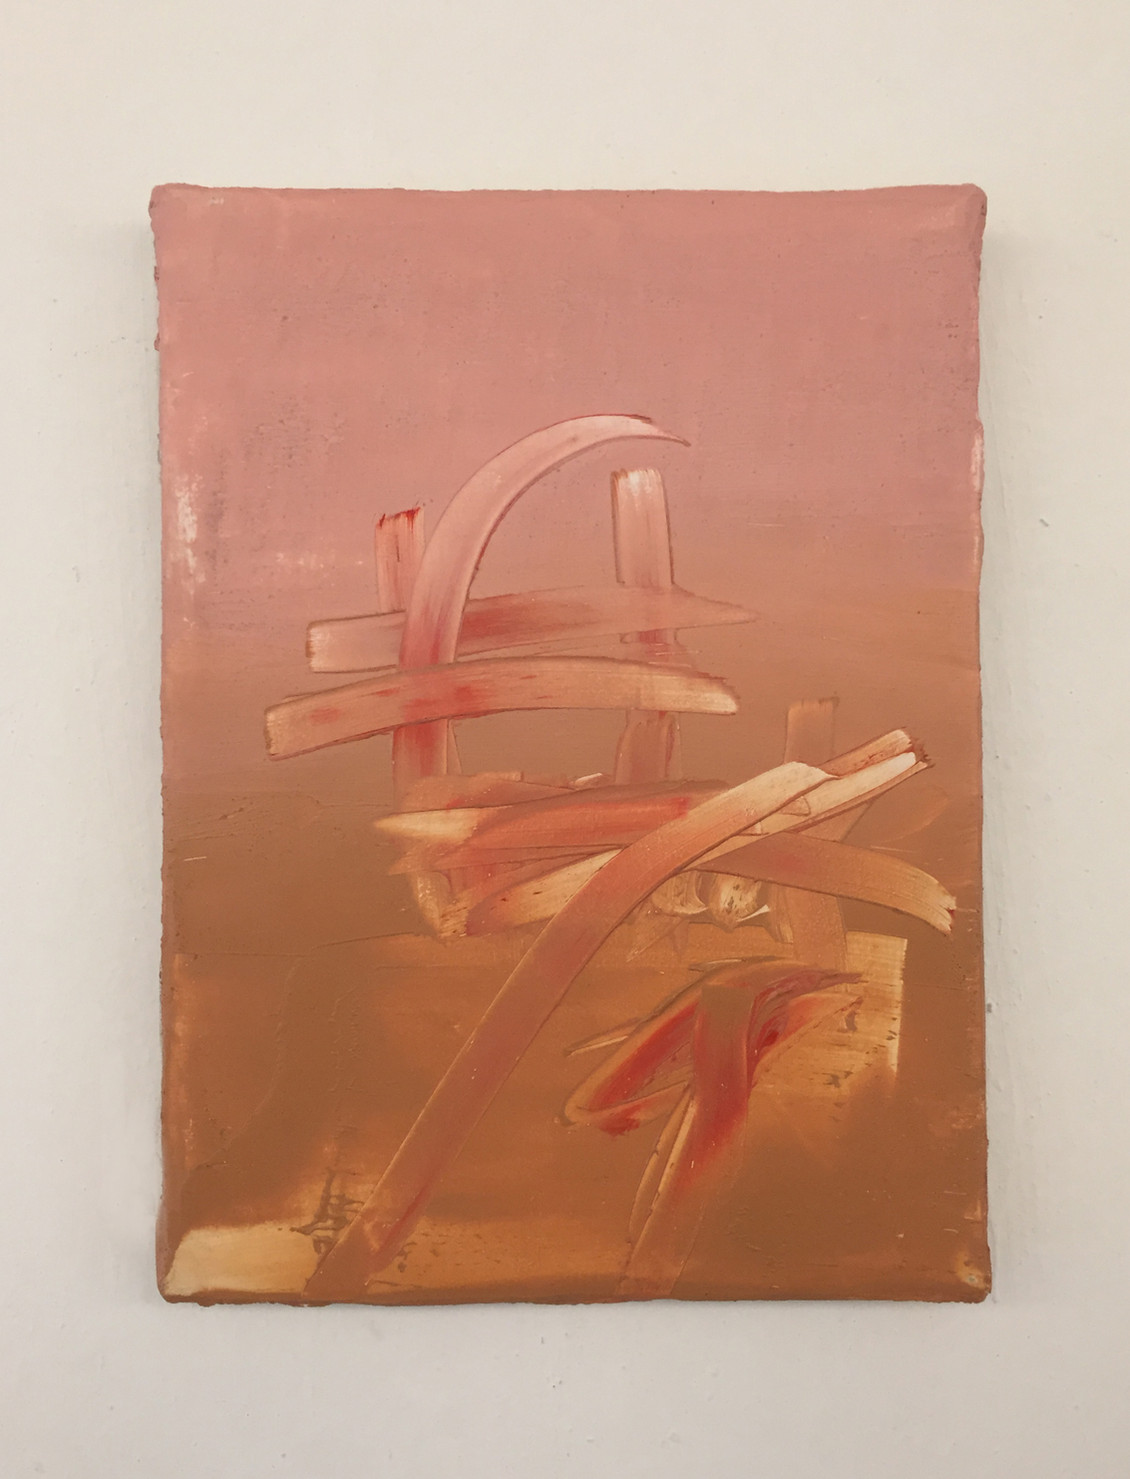 Fancy Lisptick, 2015 | Oil on canvas | 22 x 16 cm